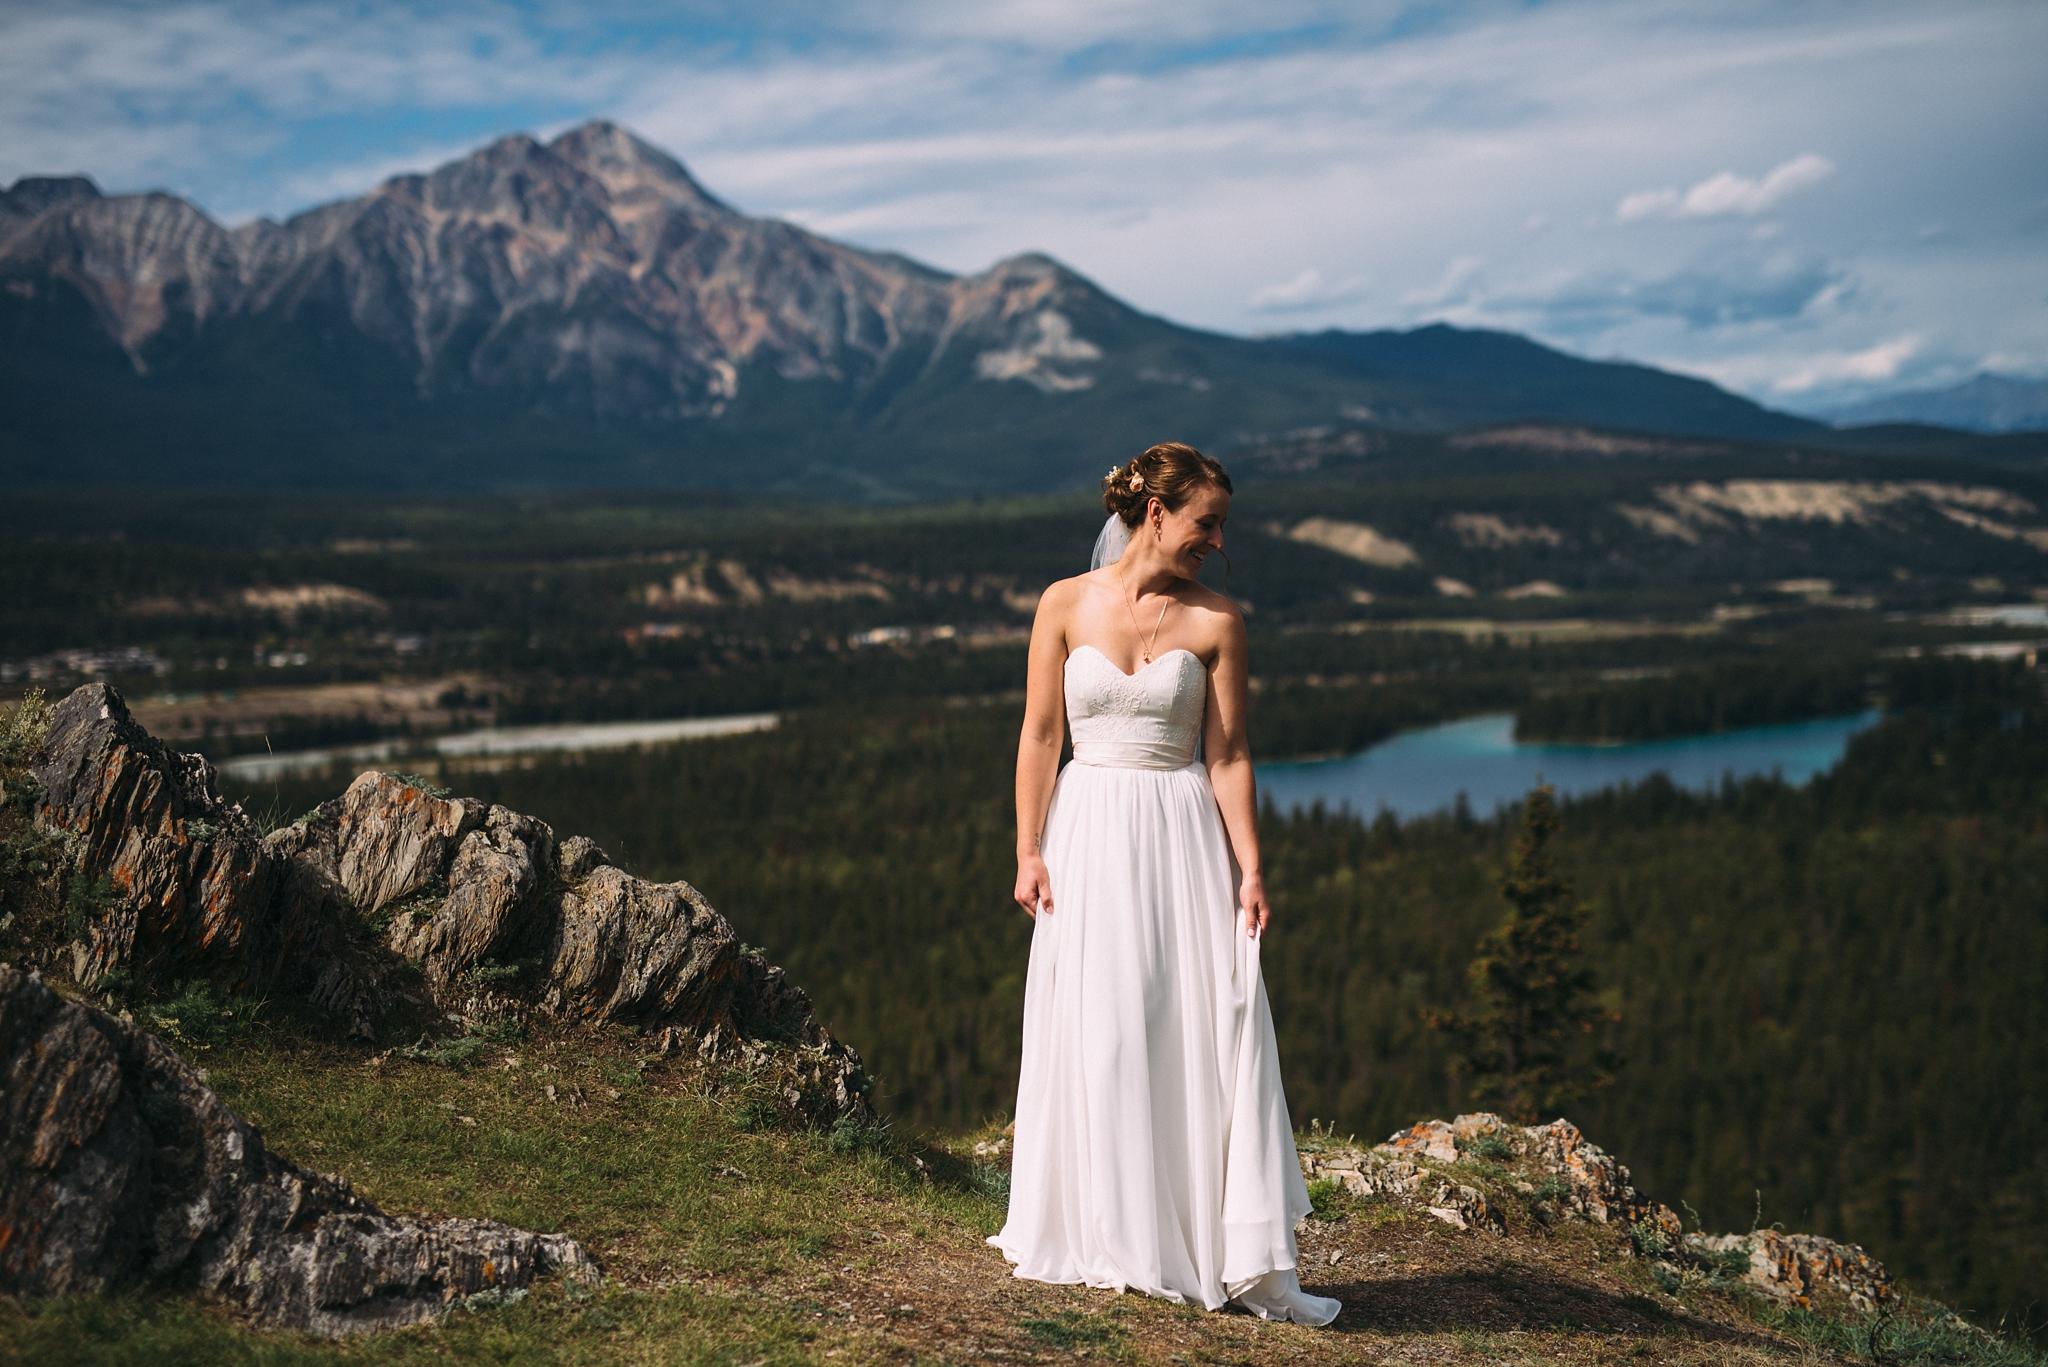 kaihla_tonai_intimate_wedding_elopement_photographer_2480